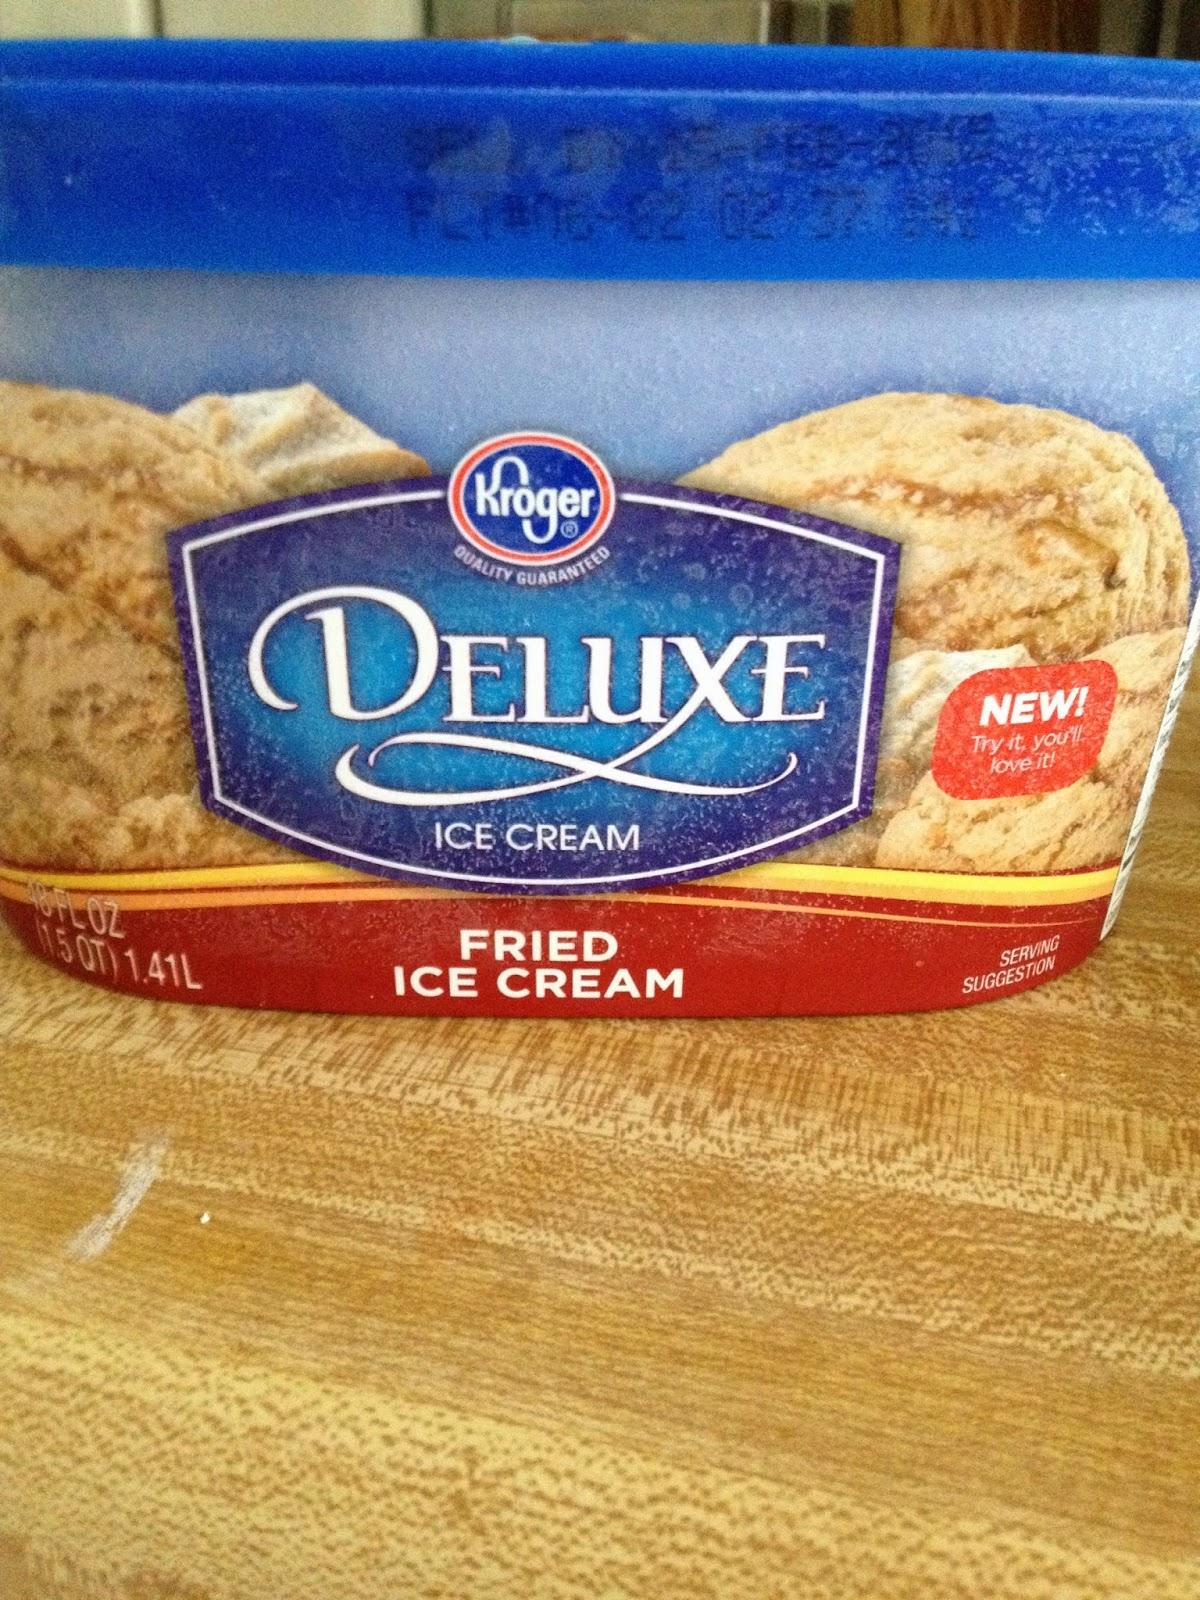 Kroger Ice Cream Cake Flavors